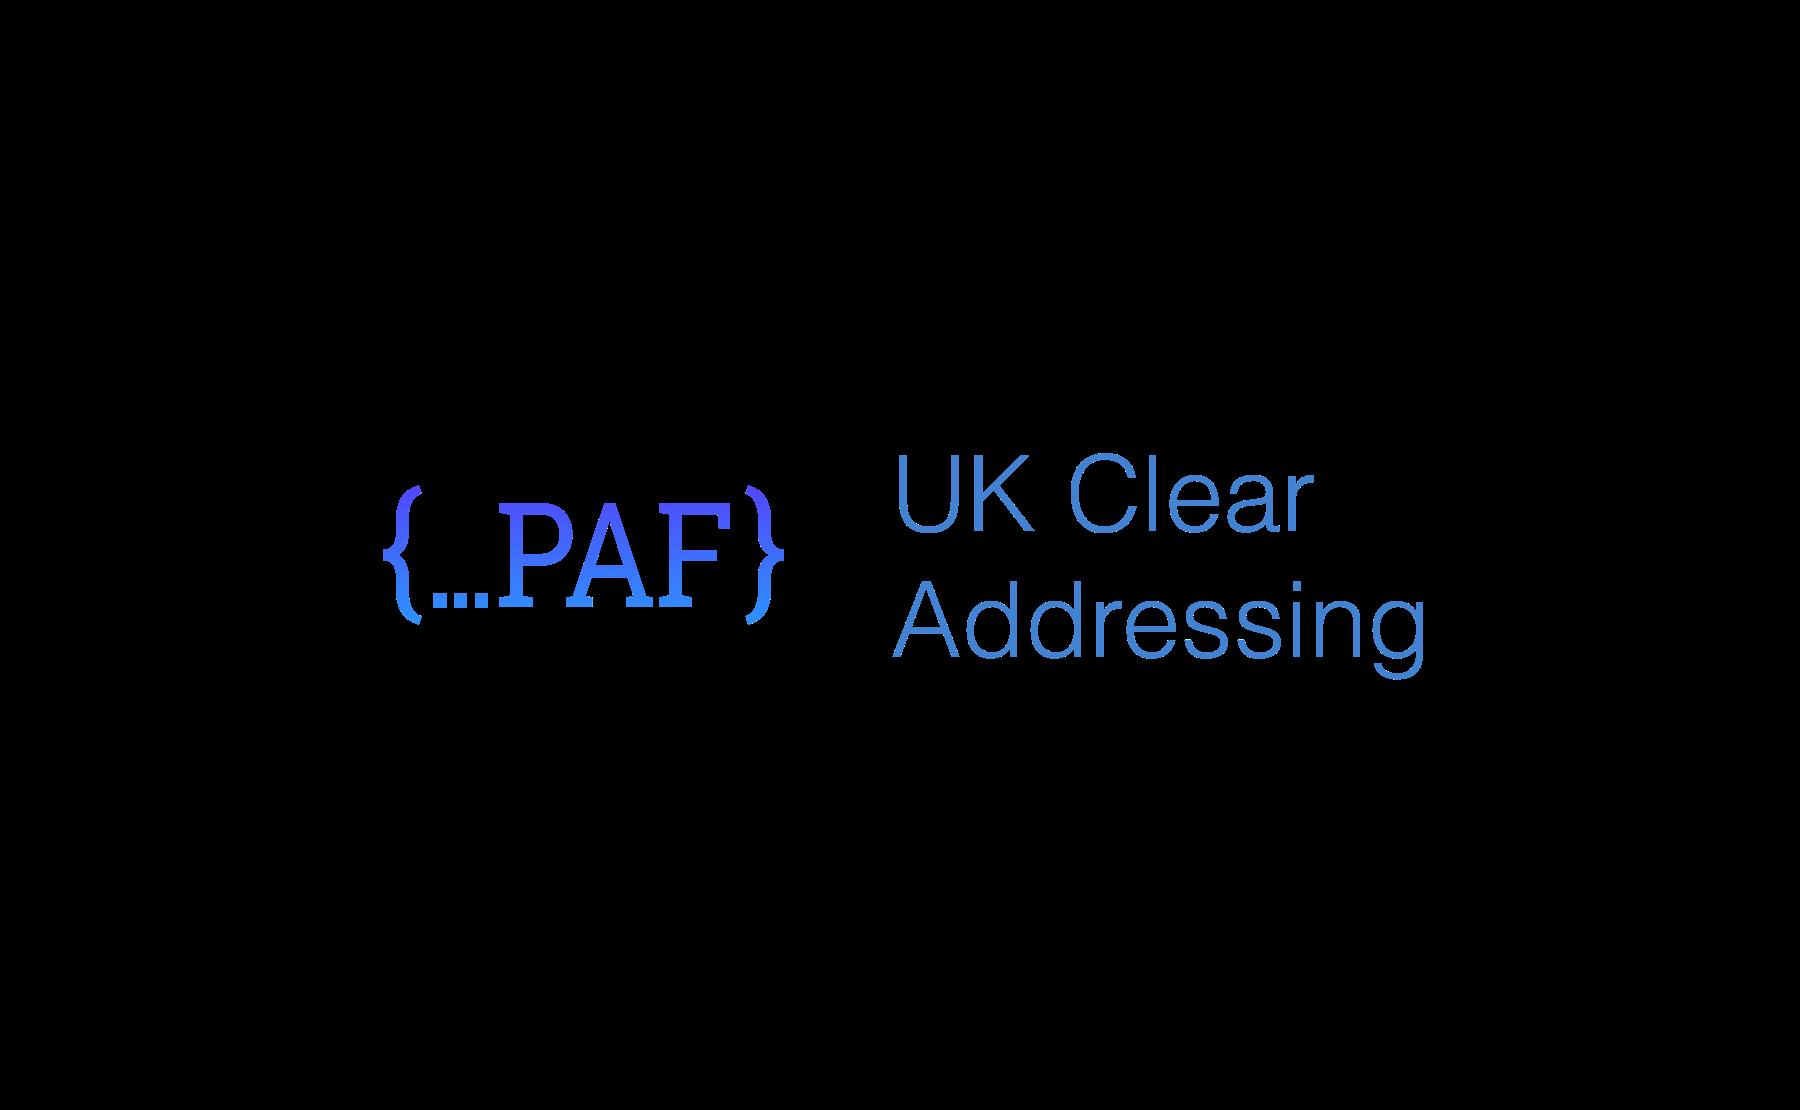 UK Clear Addressing